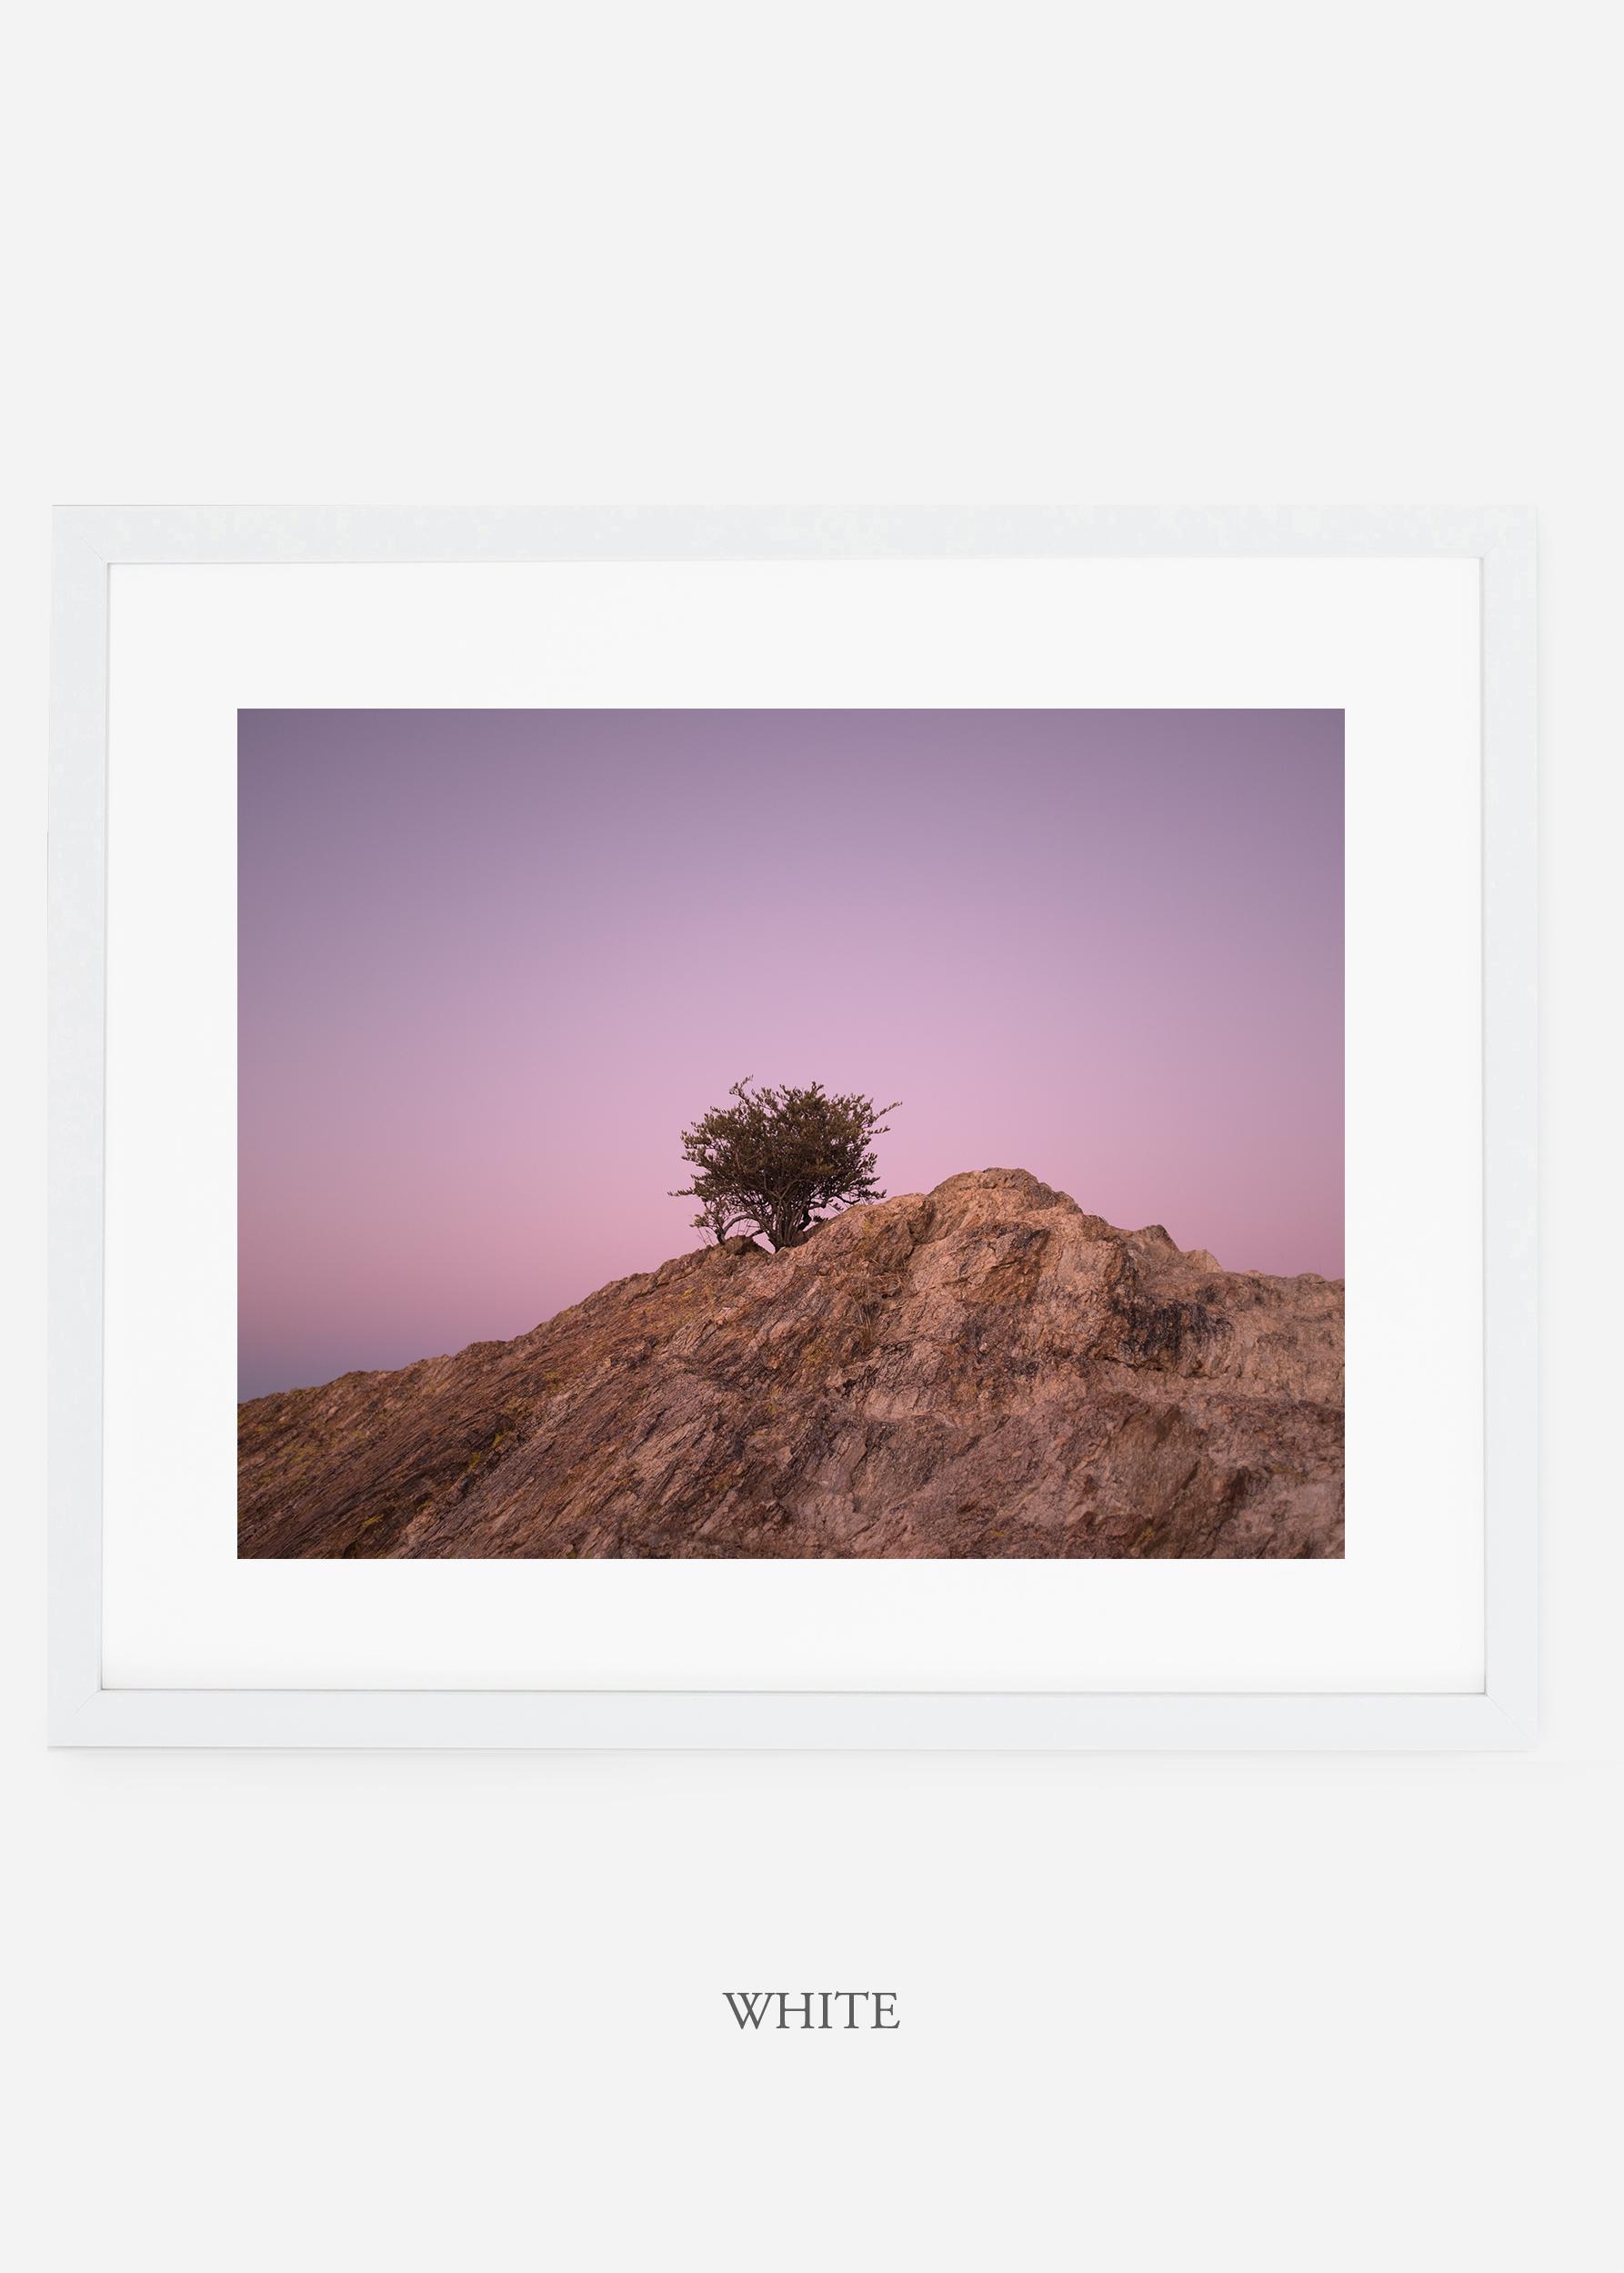 whiteframe-saguaroNo.11-wildercalifornia-art-wallart-cactusprint-homedecor-prints-arizona-botanical-artwork-interiordesign.jpg